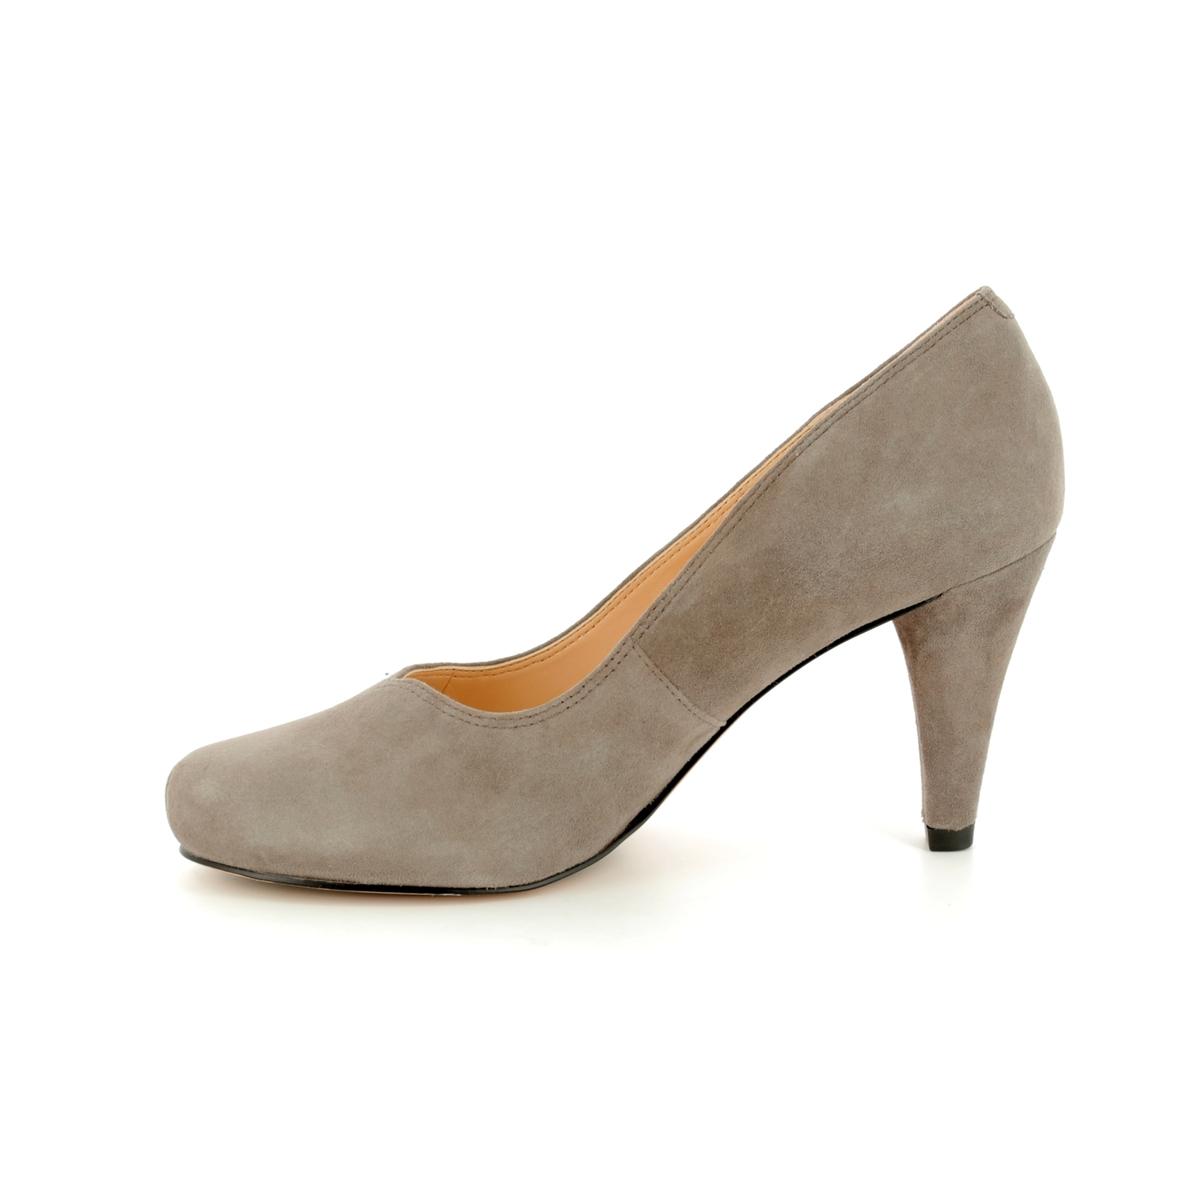 6e6792119d8b Clarks High-heeled Shoes - Taupe - 3226 94D DALIA ROSE